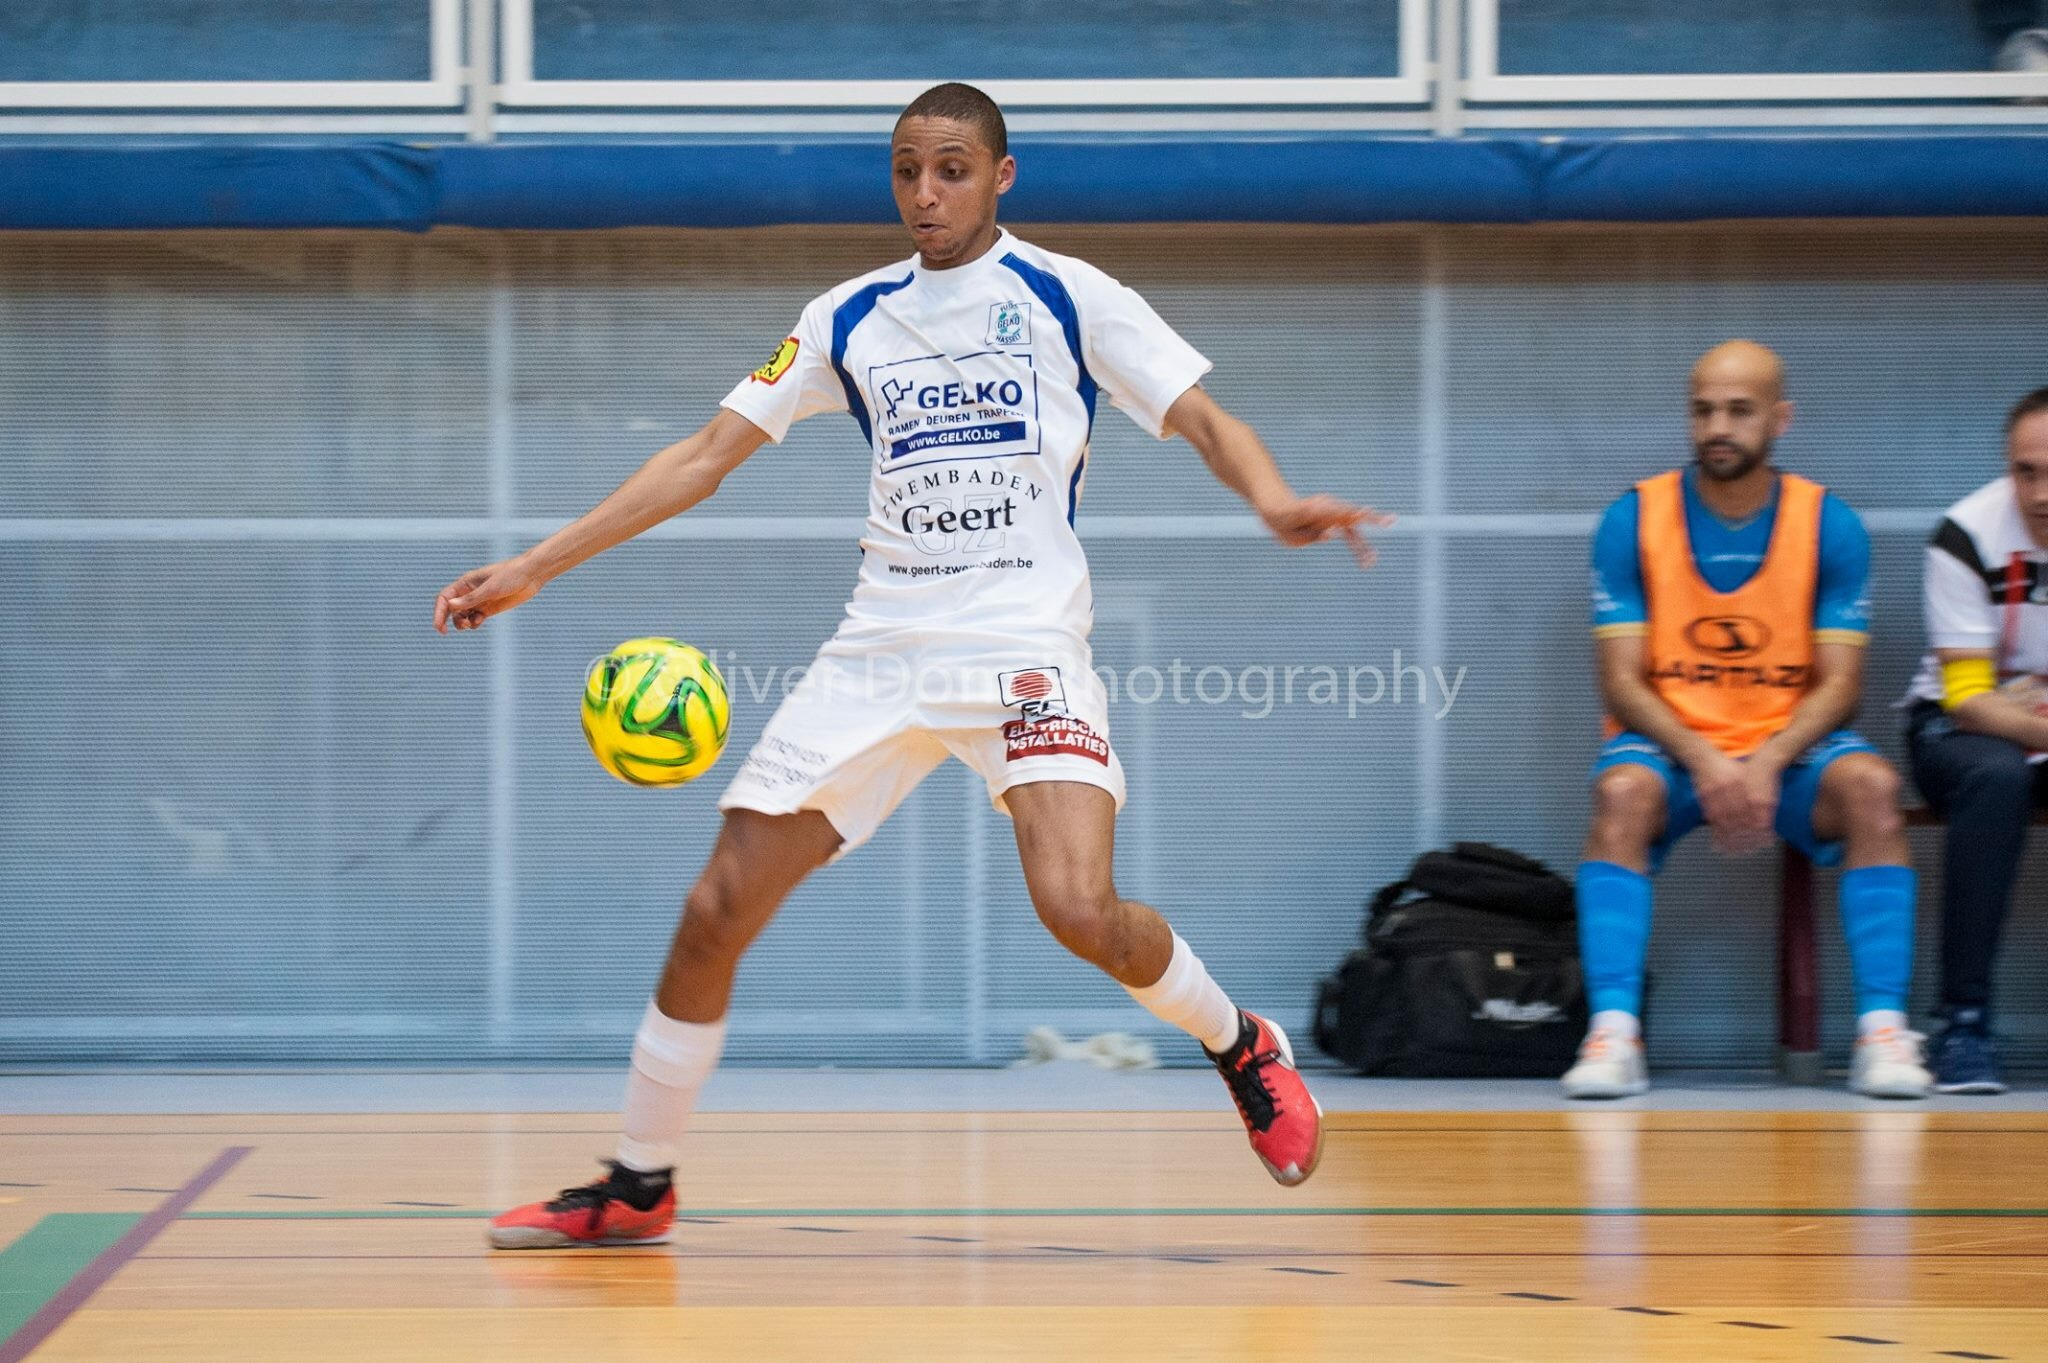 Gelko Hasselt – FC Marlene